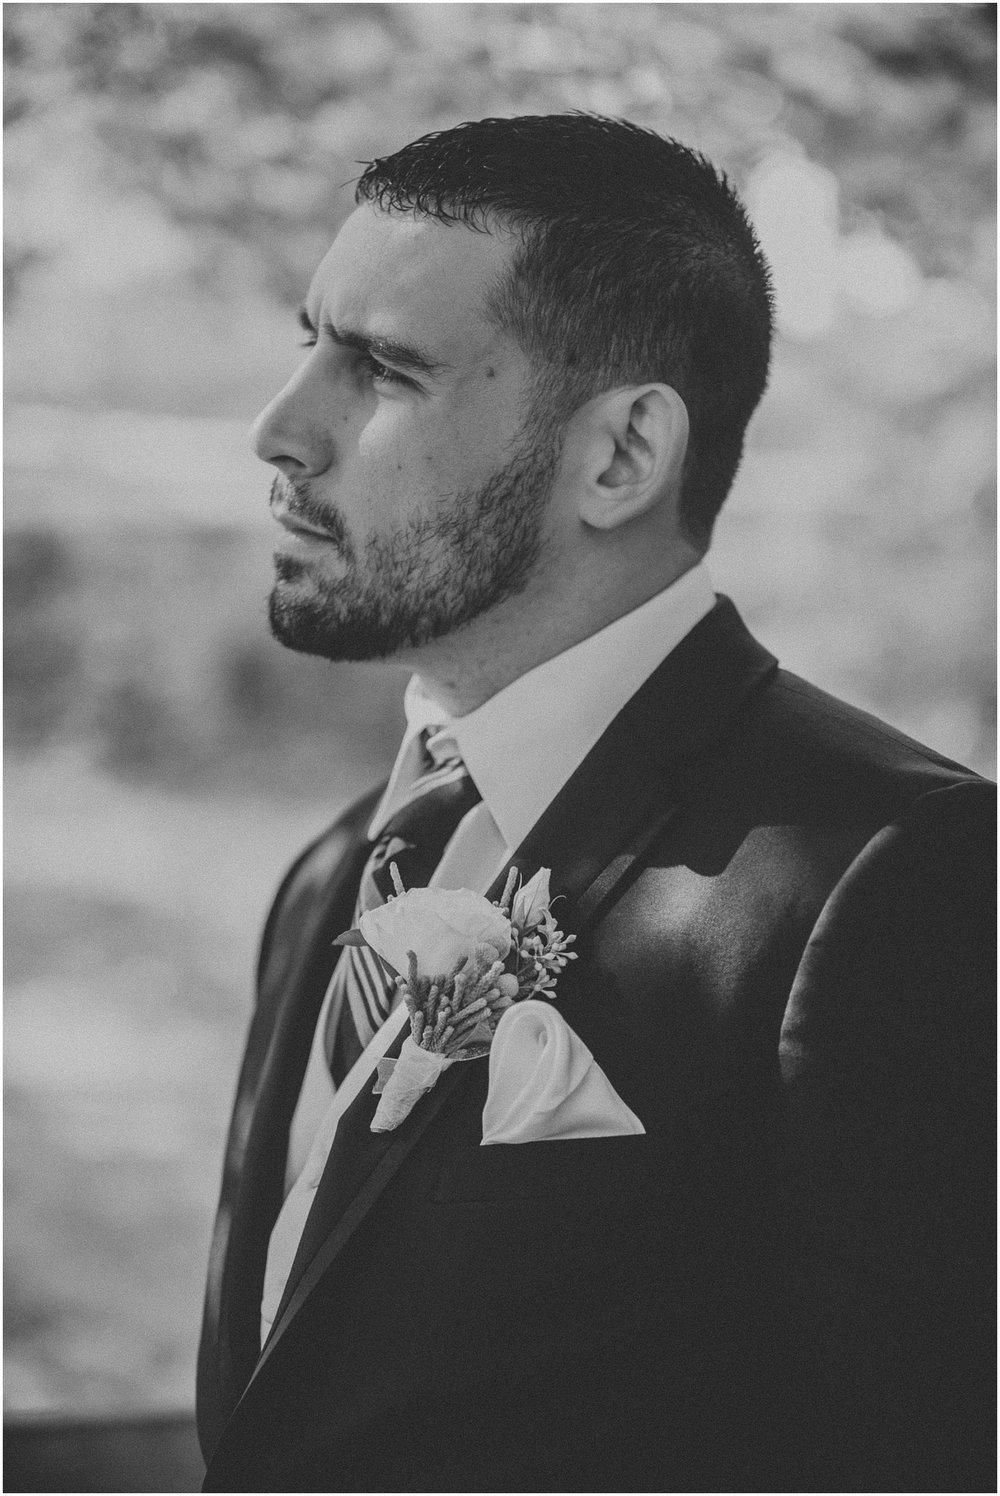 waterloo-village-waterloo village-wedding-outdoor wedding-rustic-boemian-new jersey-bride-groom-wedding party-davids bridal-wedding dress-wedding-first kiss-intimate wedding_0354.jpg